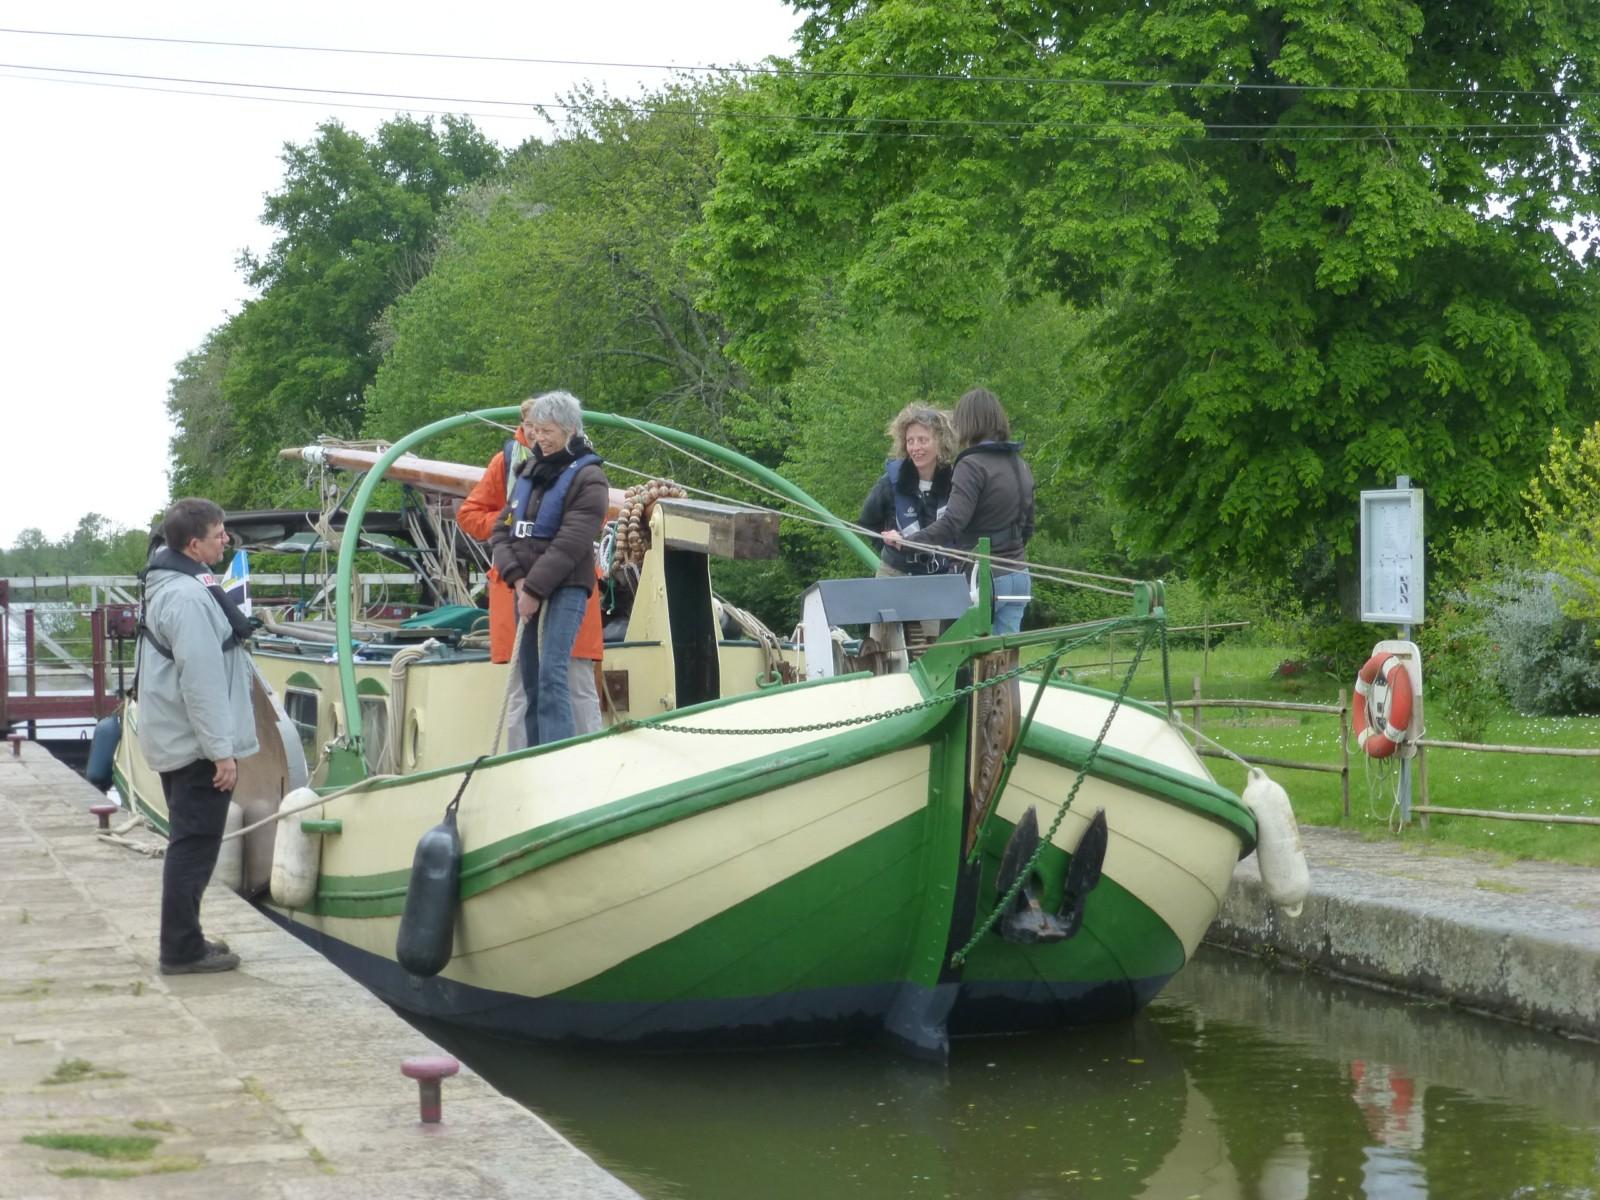 http://cdt85.media.tourinsoft.eu/upload/140508-Cornelia-Canal-Nort.JPG